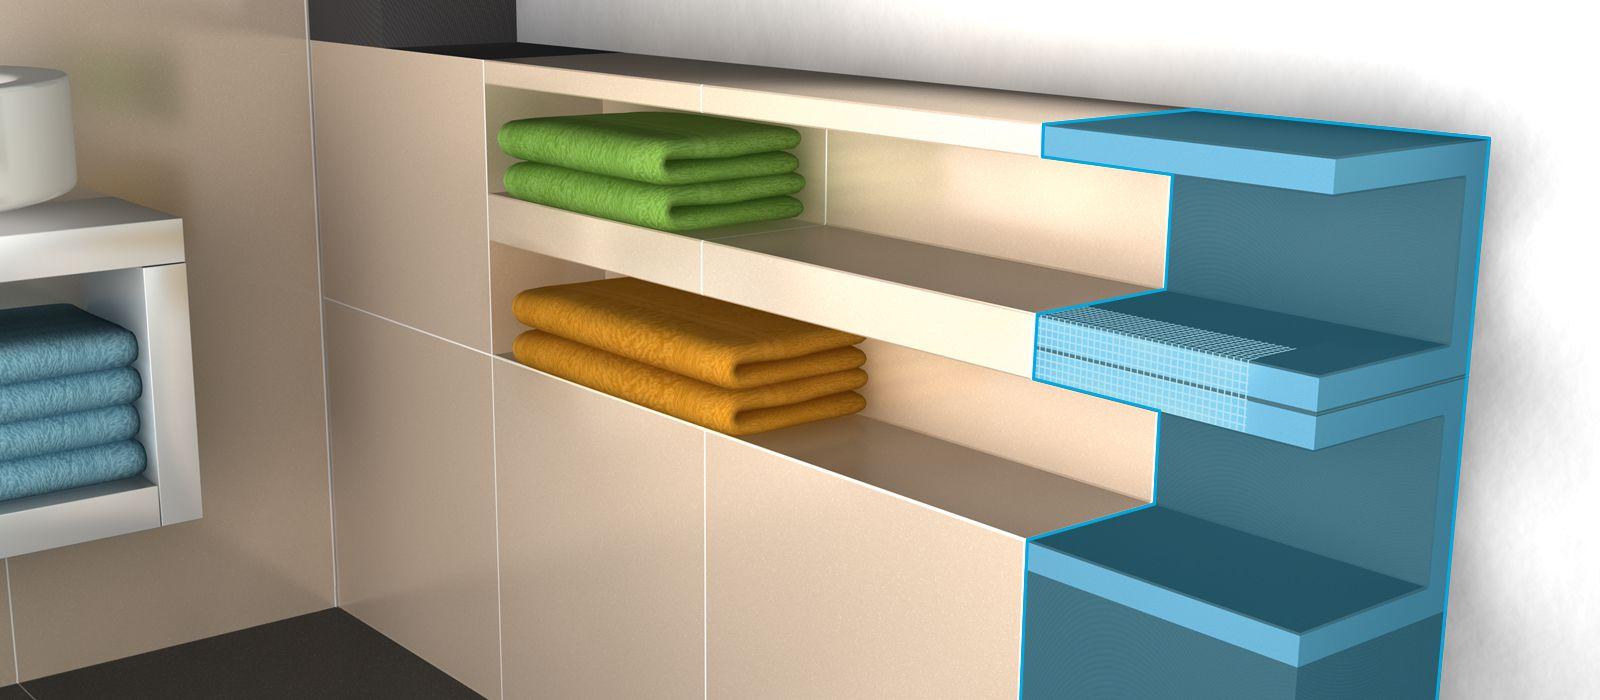 wedi mensolo l u fertigelemente f r verkleidungen und regale. Black Bedroom Furniture Sets. Home Design Ideas